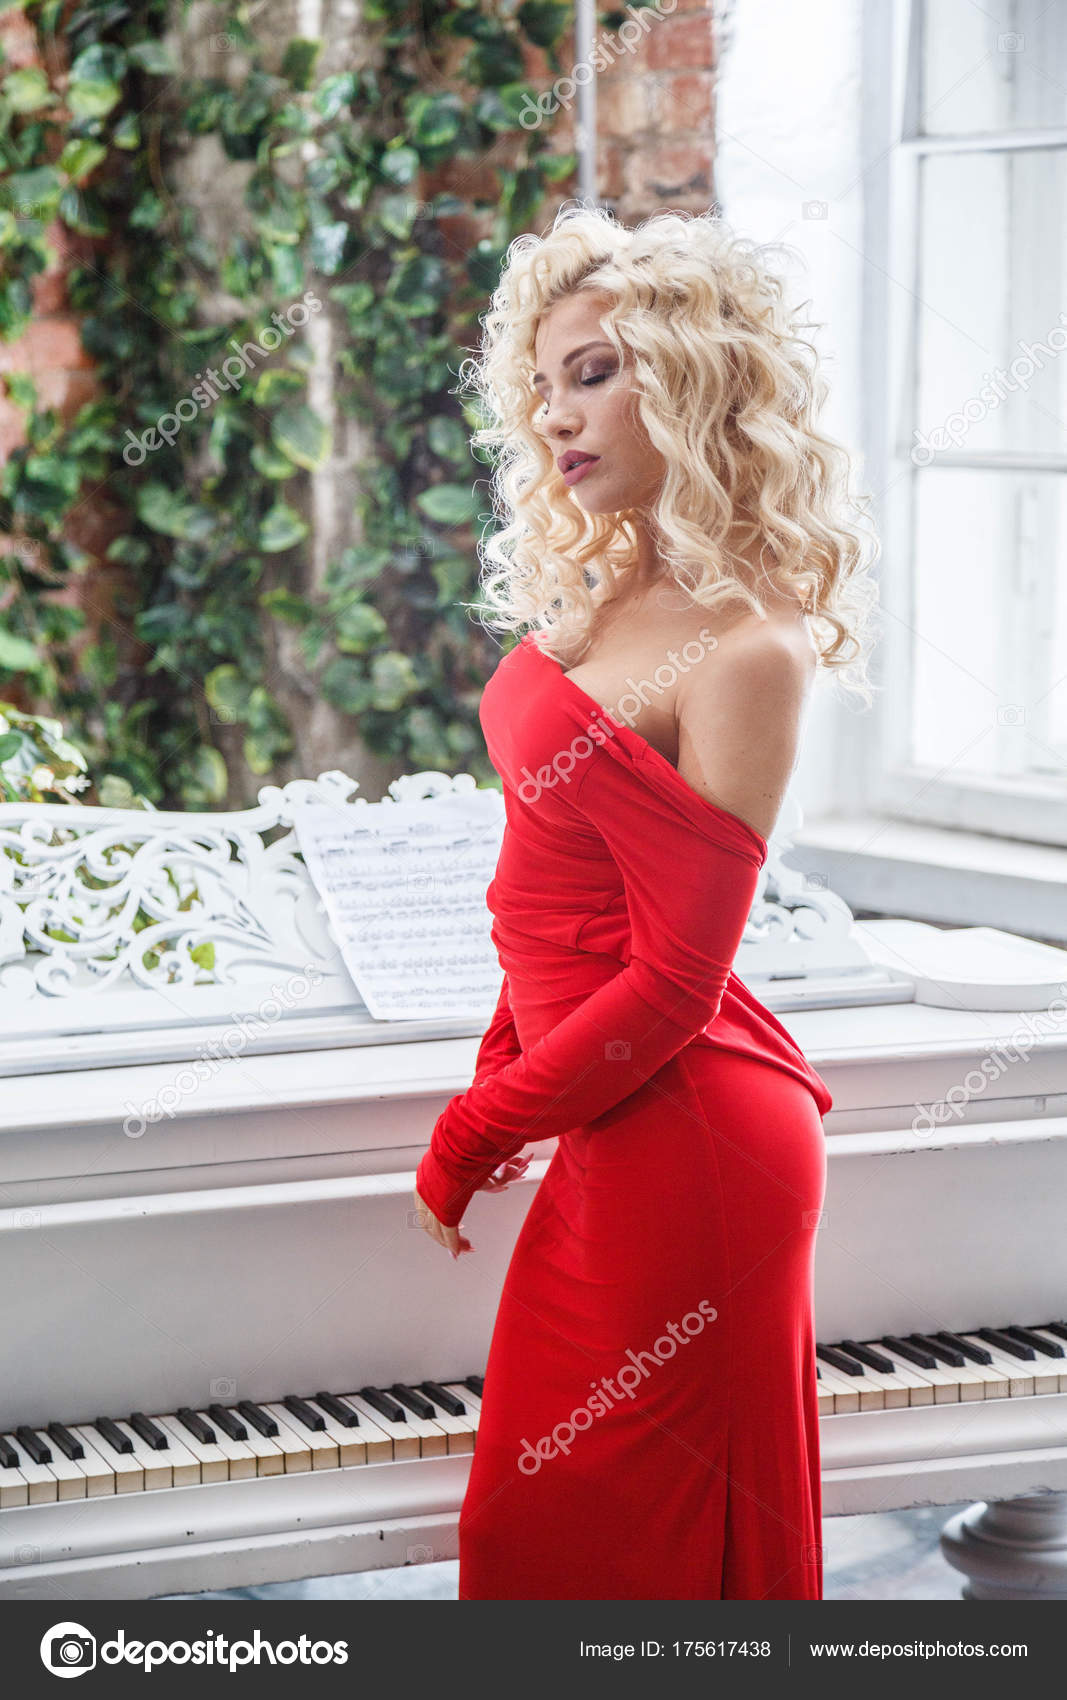 c6d8940de83a Μόδα στούντιο πορτρέτο του όμορφη ξανθιά γυναίκα με σγουρά μαλλιά και κομψό  μακιγιάζ